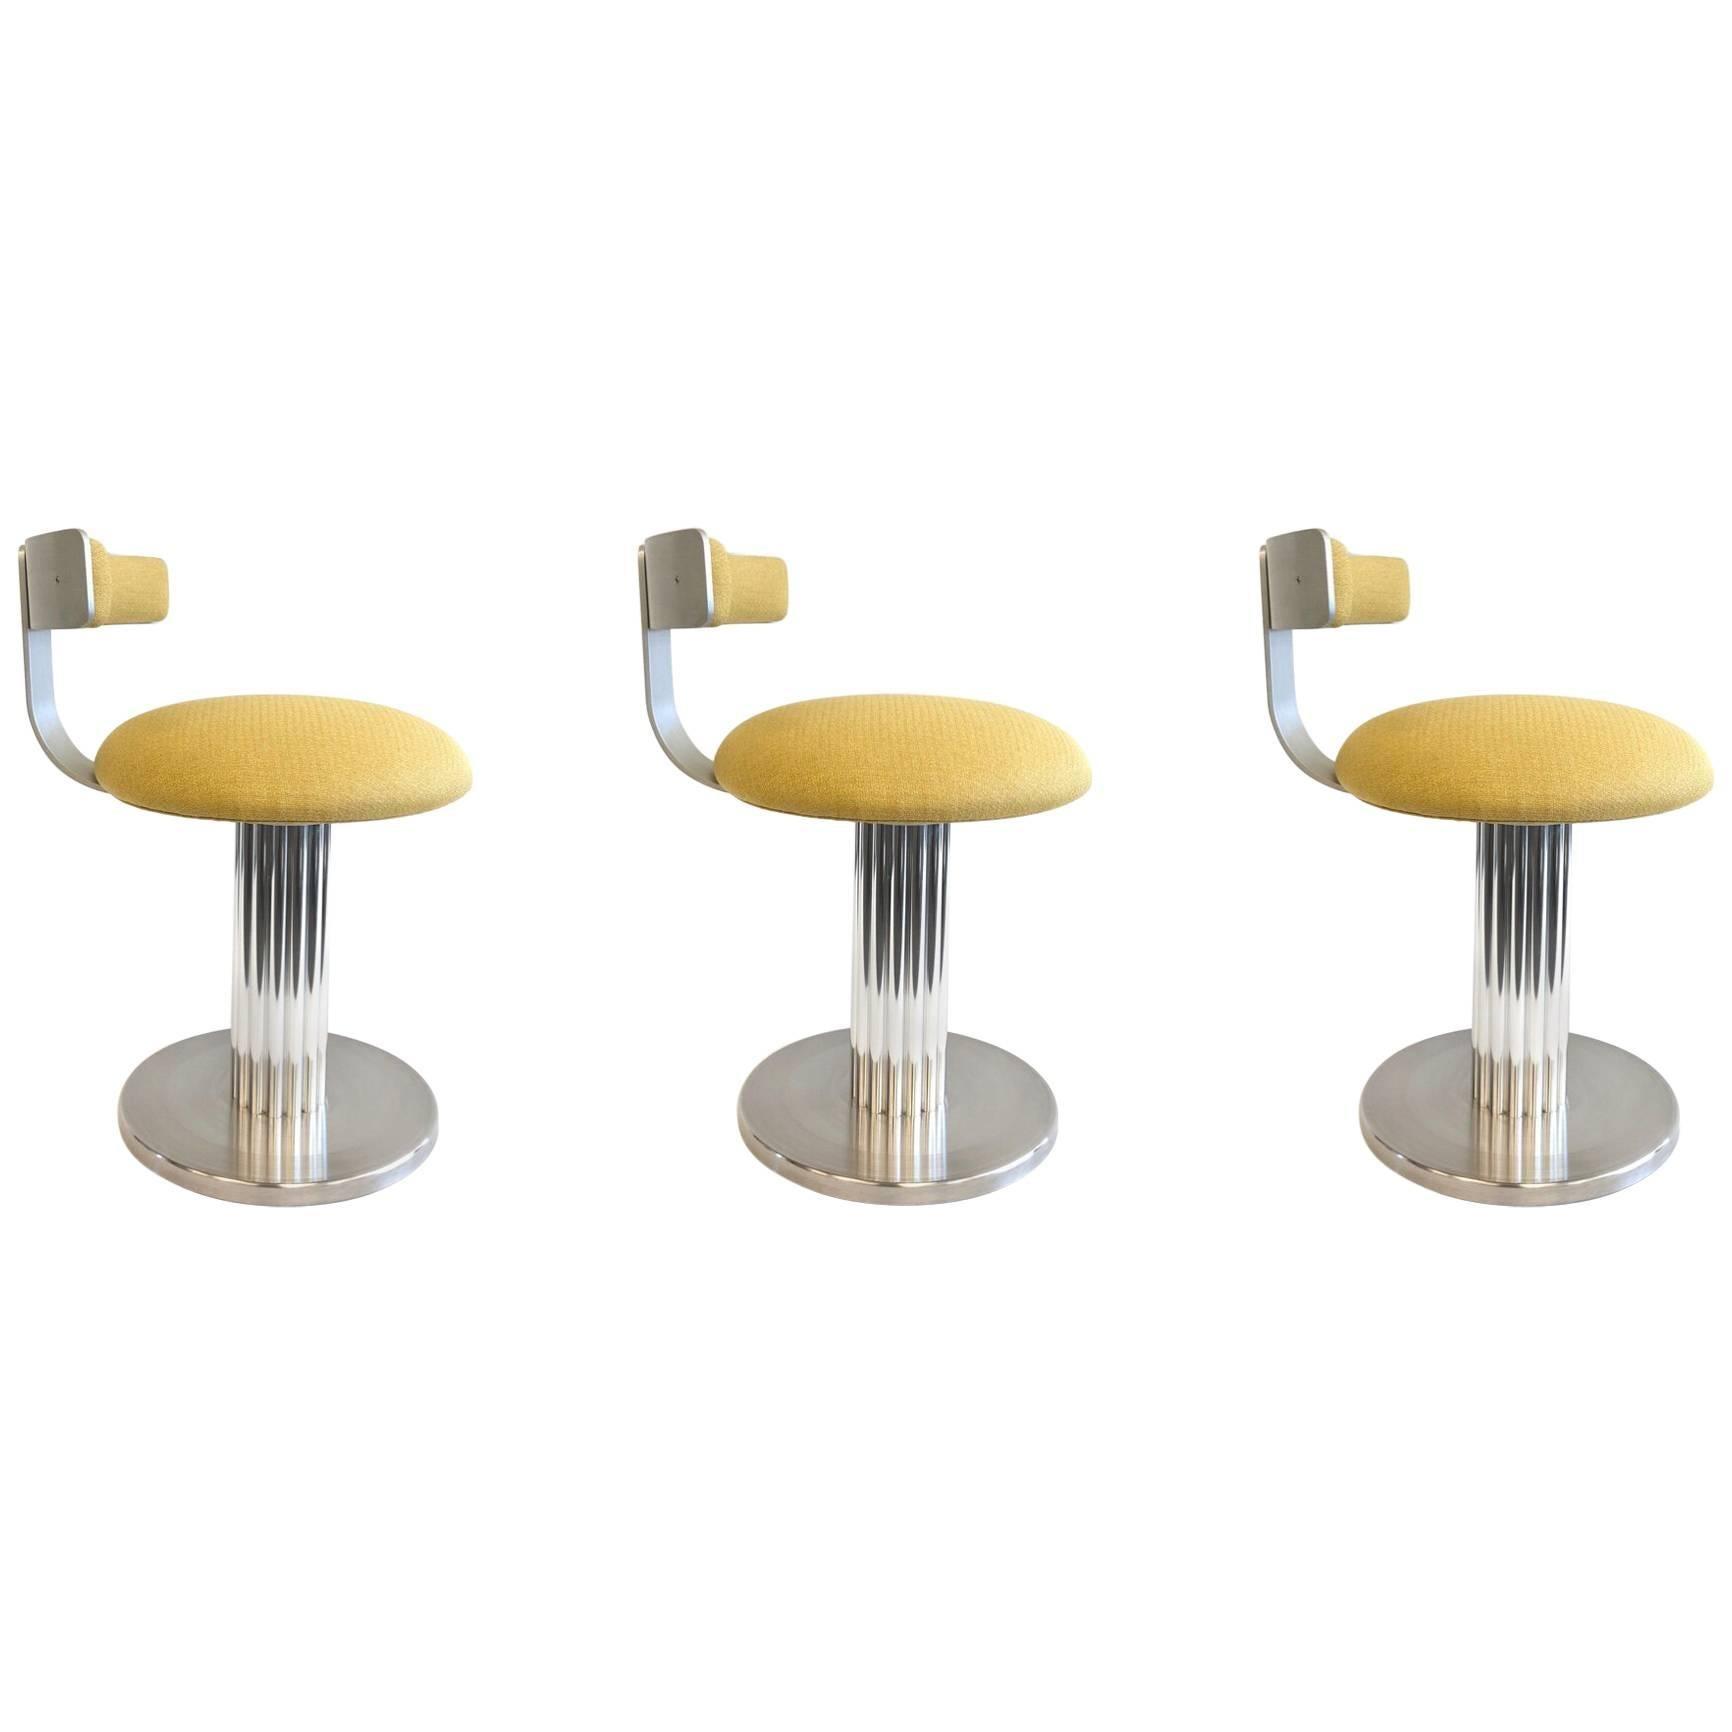 Set of Three Aluminium Swivel Stools by Design for Leisure Ltd